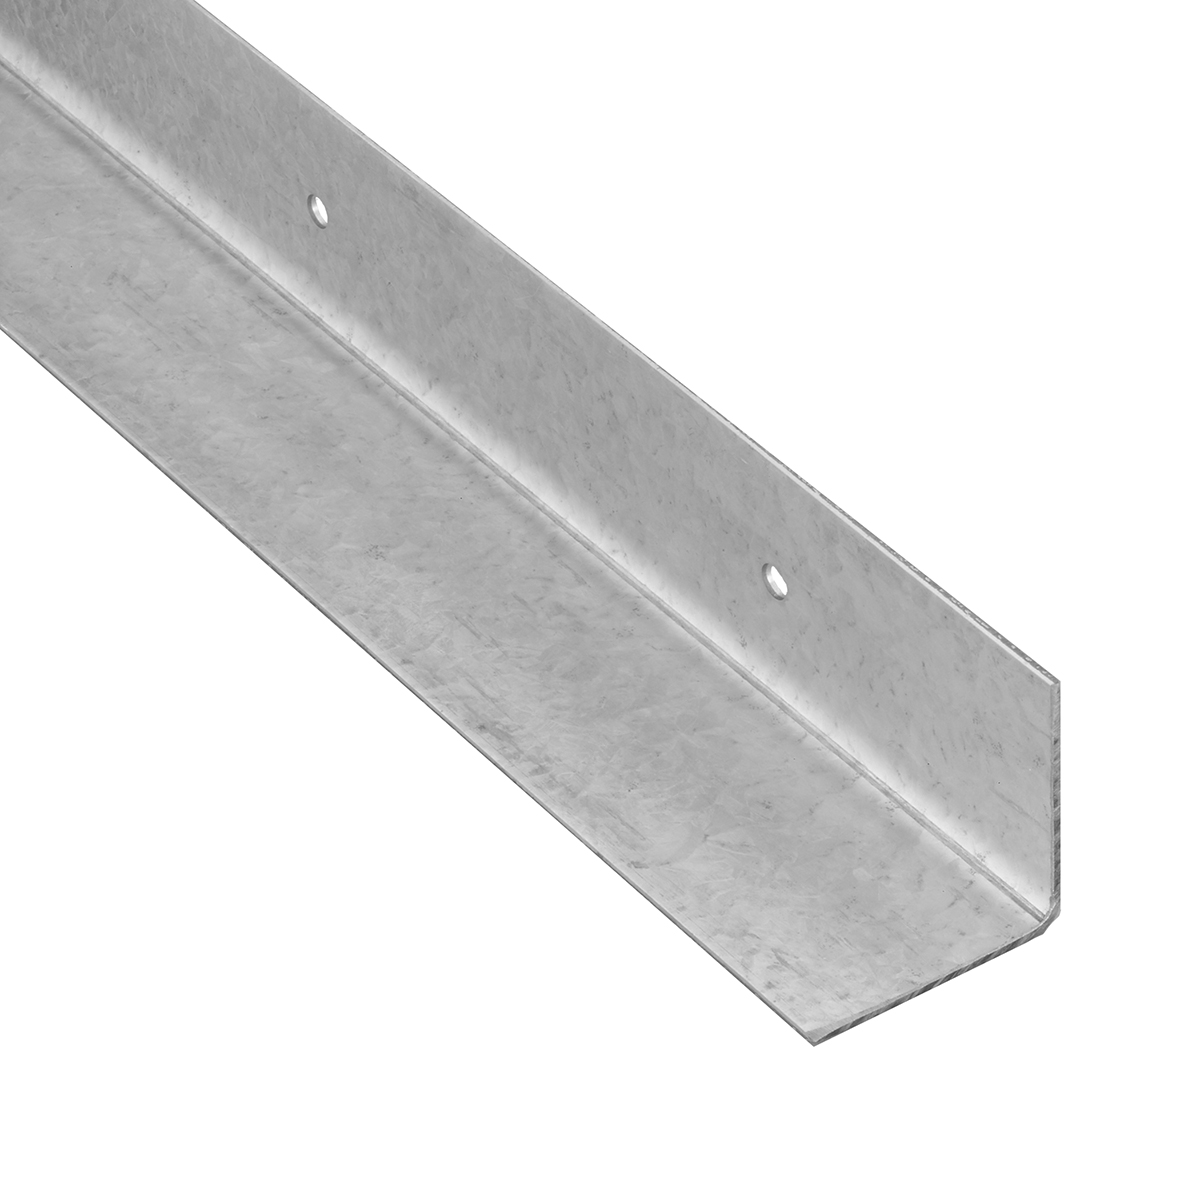 Duct Connectors & Components | Ward